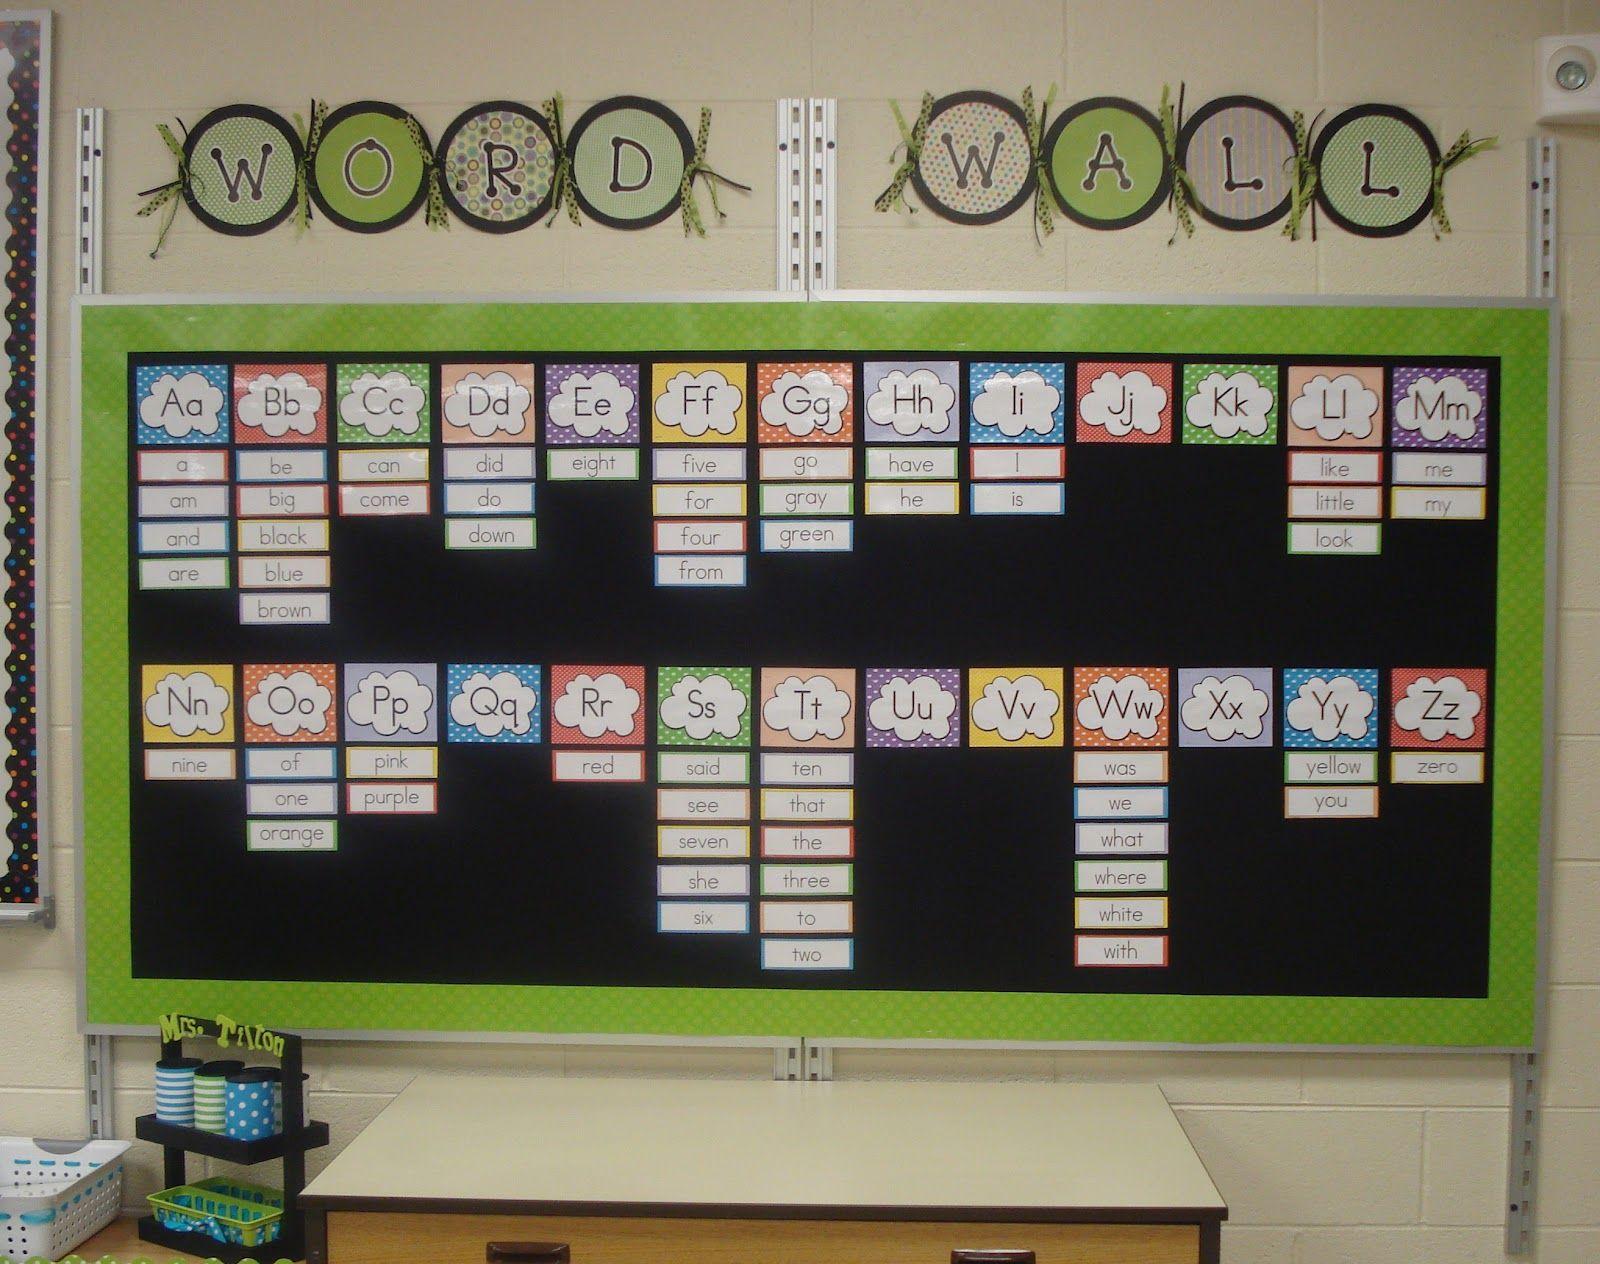 Classroom Wall Ideas : Storage tip interactive word wall bulletin board and